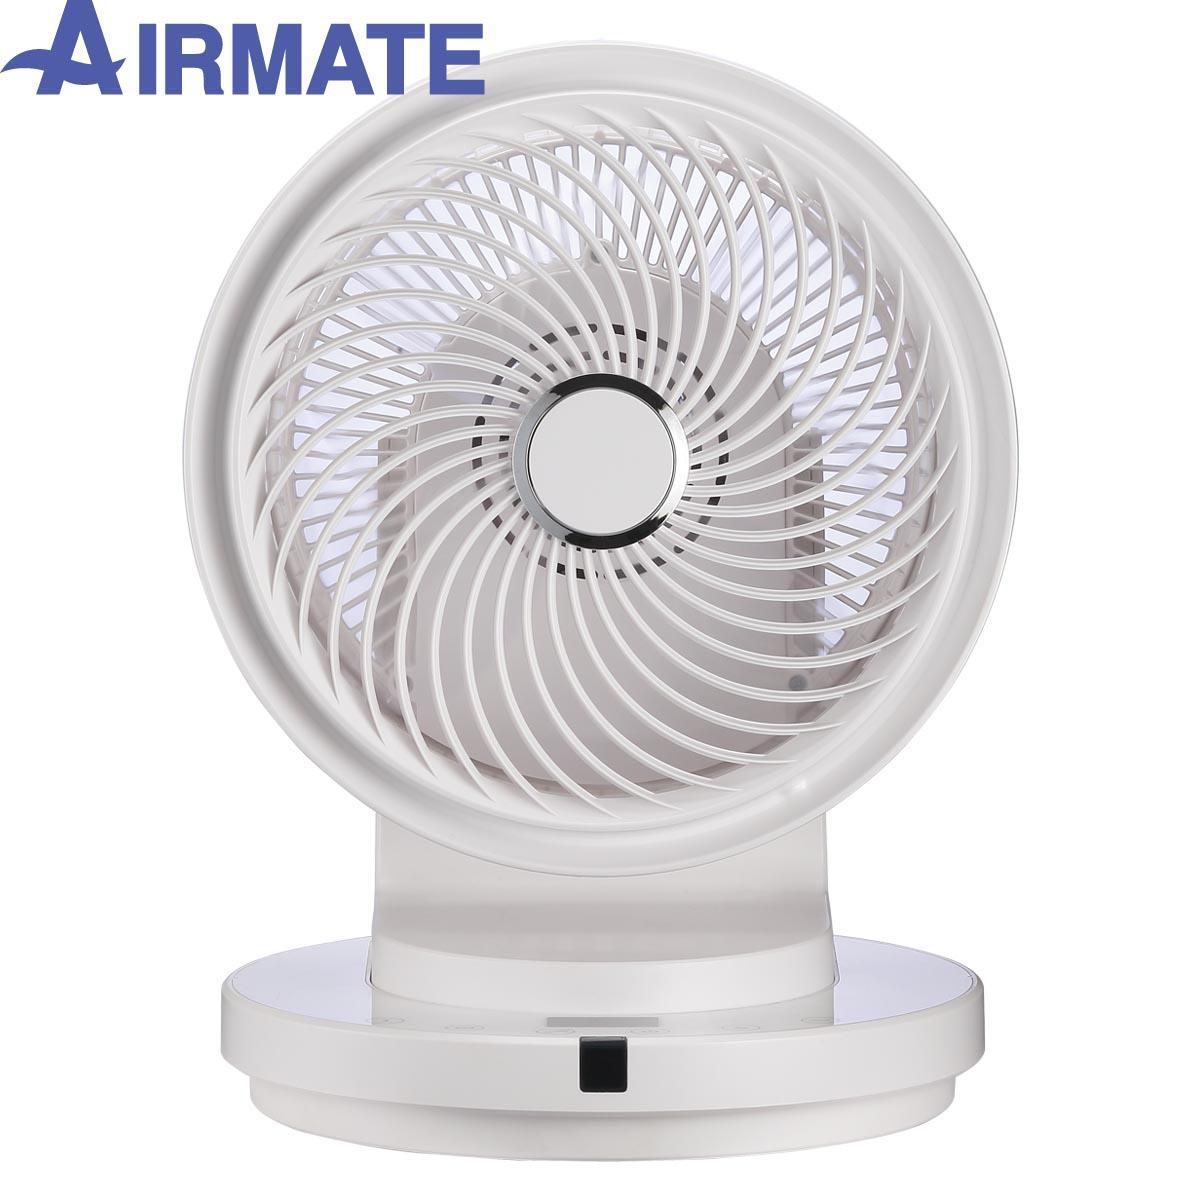 Airmate艾美特 日系冬夏兩用9吋DC直流循環扇 -FB2352R